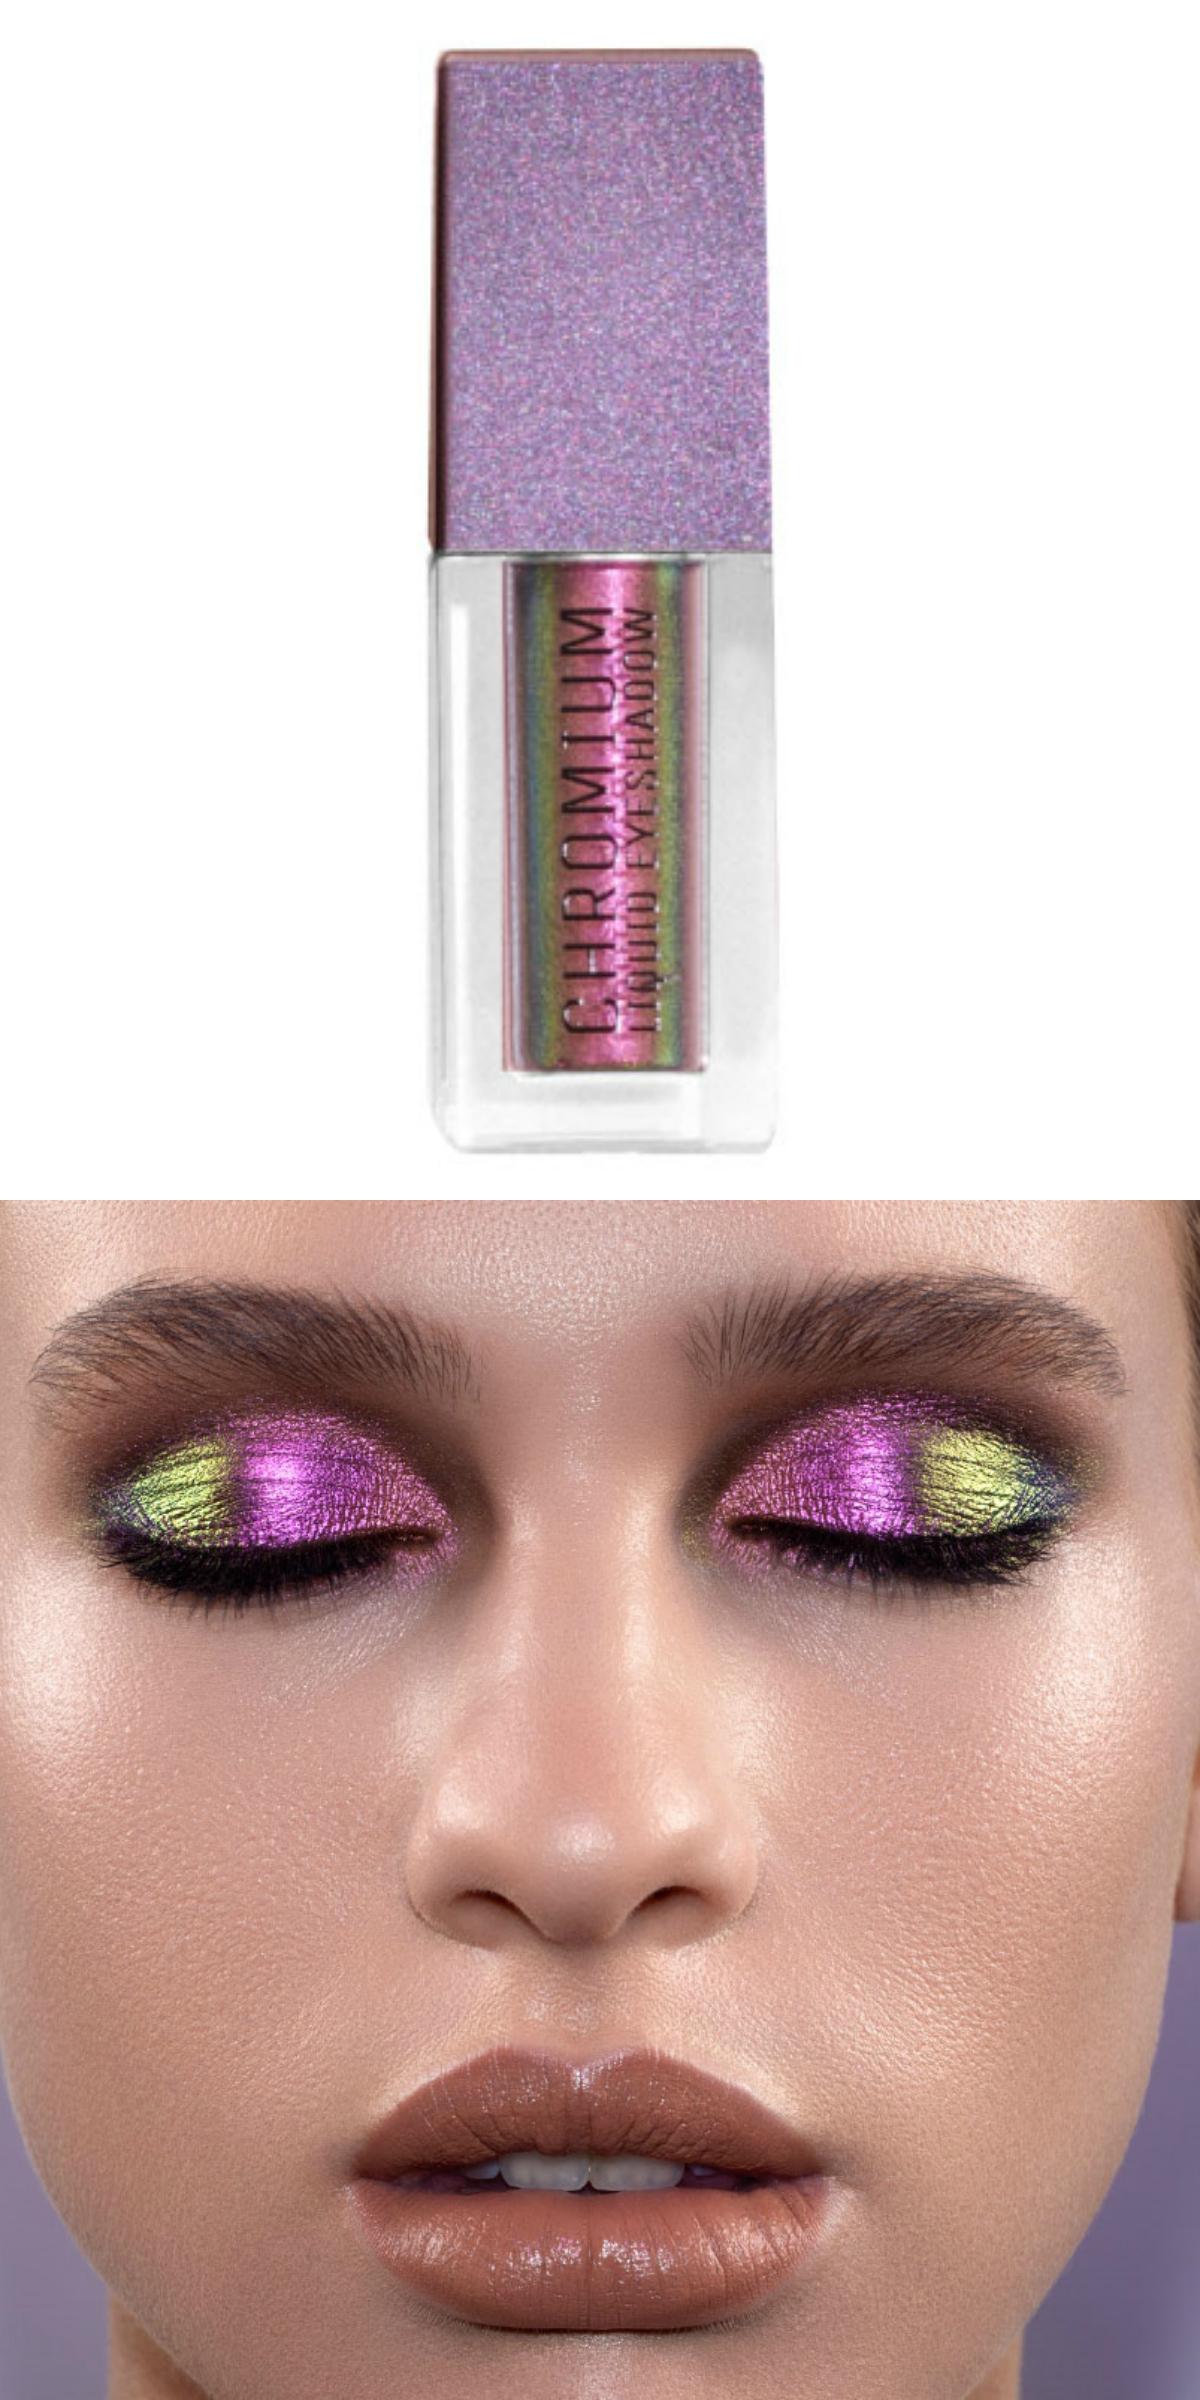 Natasha Denona Chromium Liquid Eyeshadow Collection